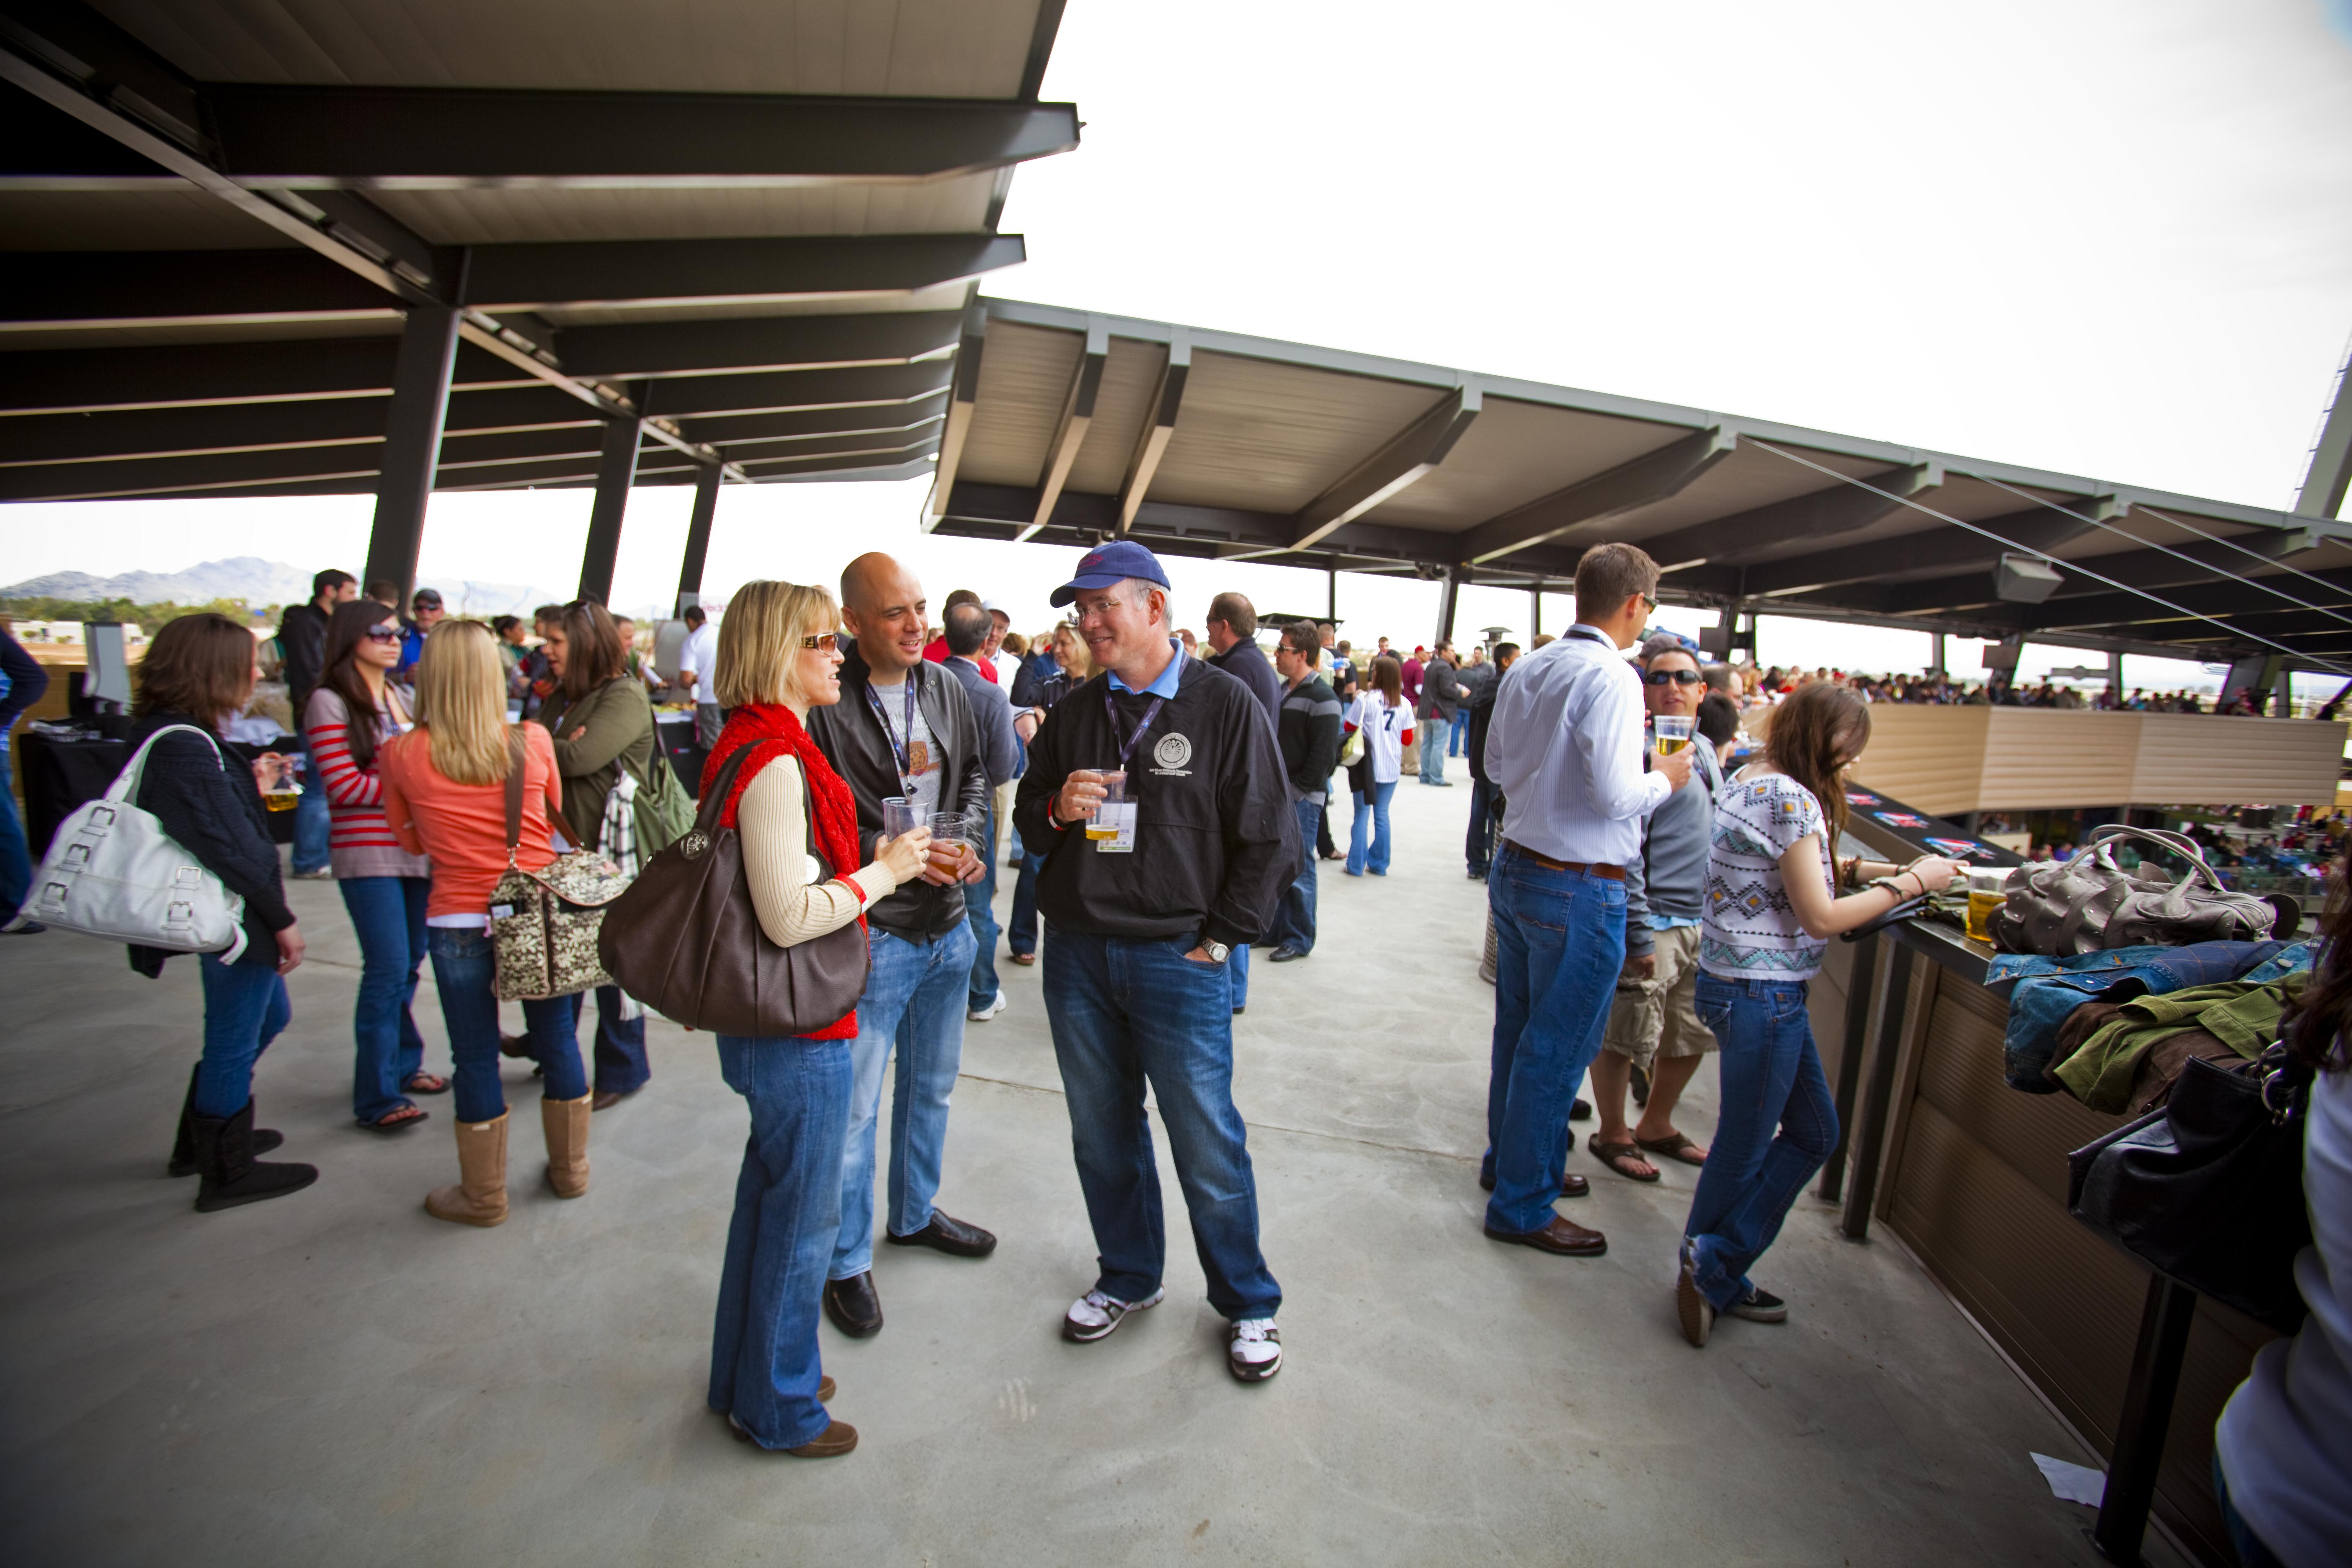 Spring Training Colorado Rockies v Arizona Diamondbacks, Salt River Fields Opening Day